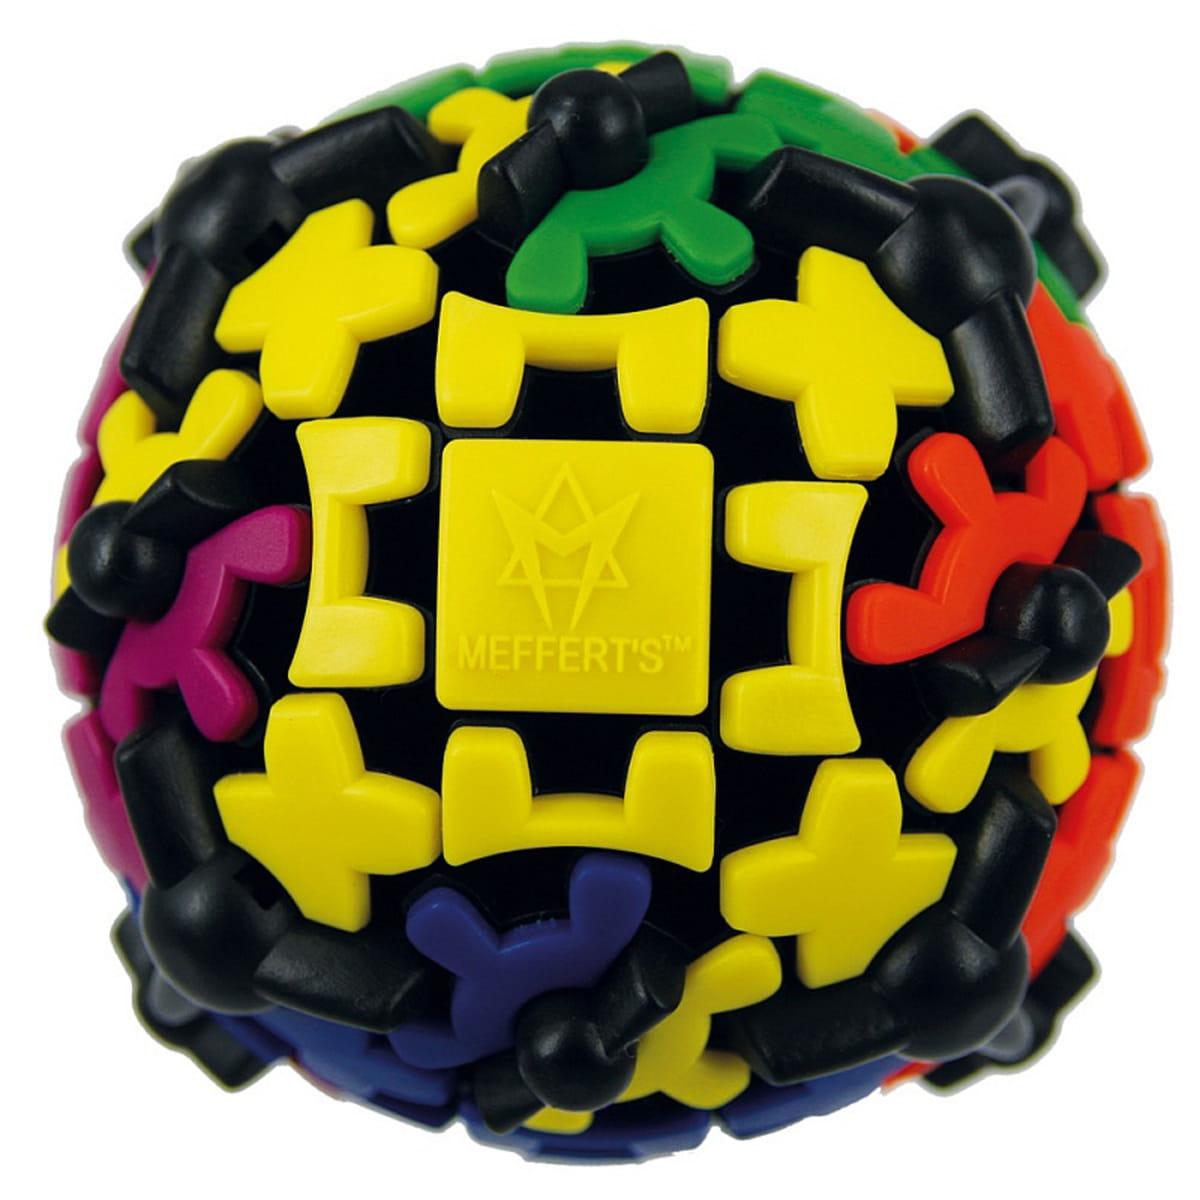 Головоломка Mefferts Шестеренчатый шар